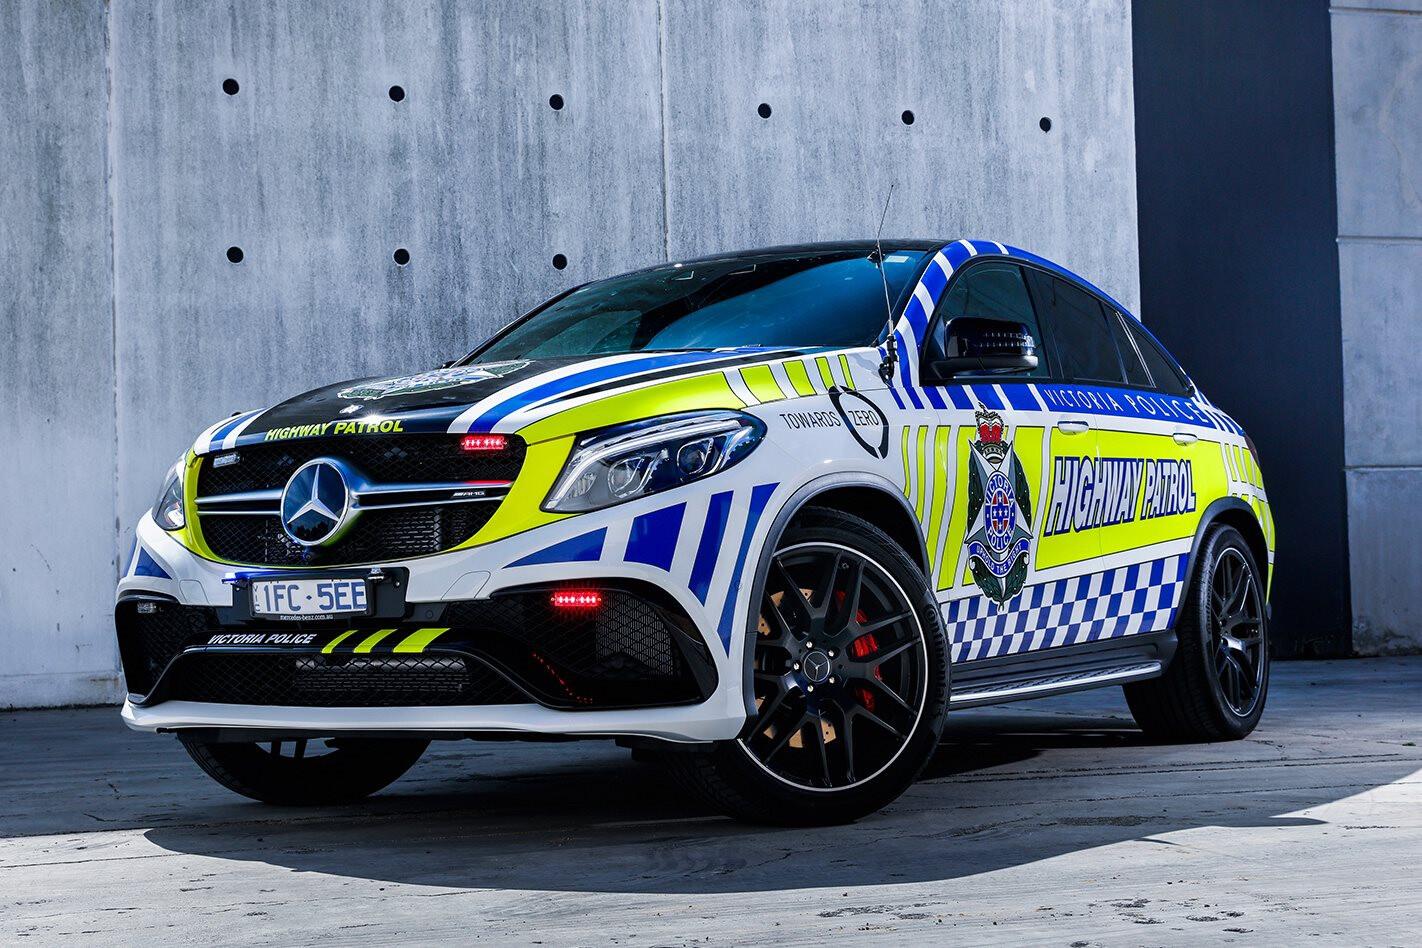 Mercedes Benz GLE 63 Victoria Police Suv Jpg